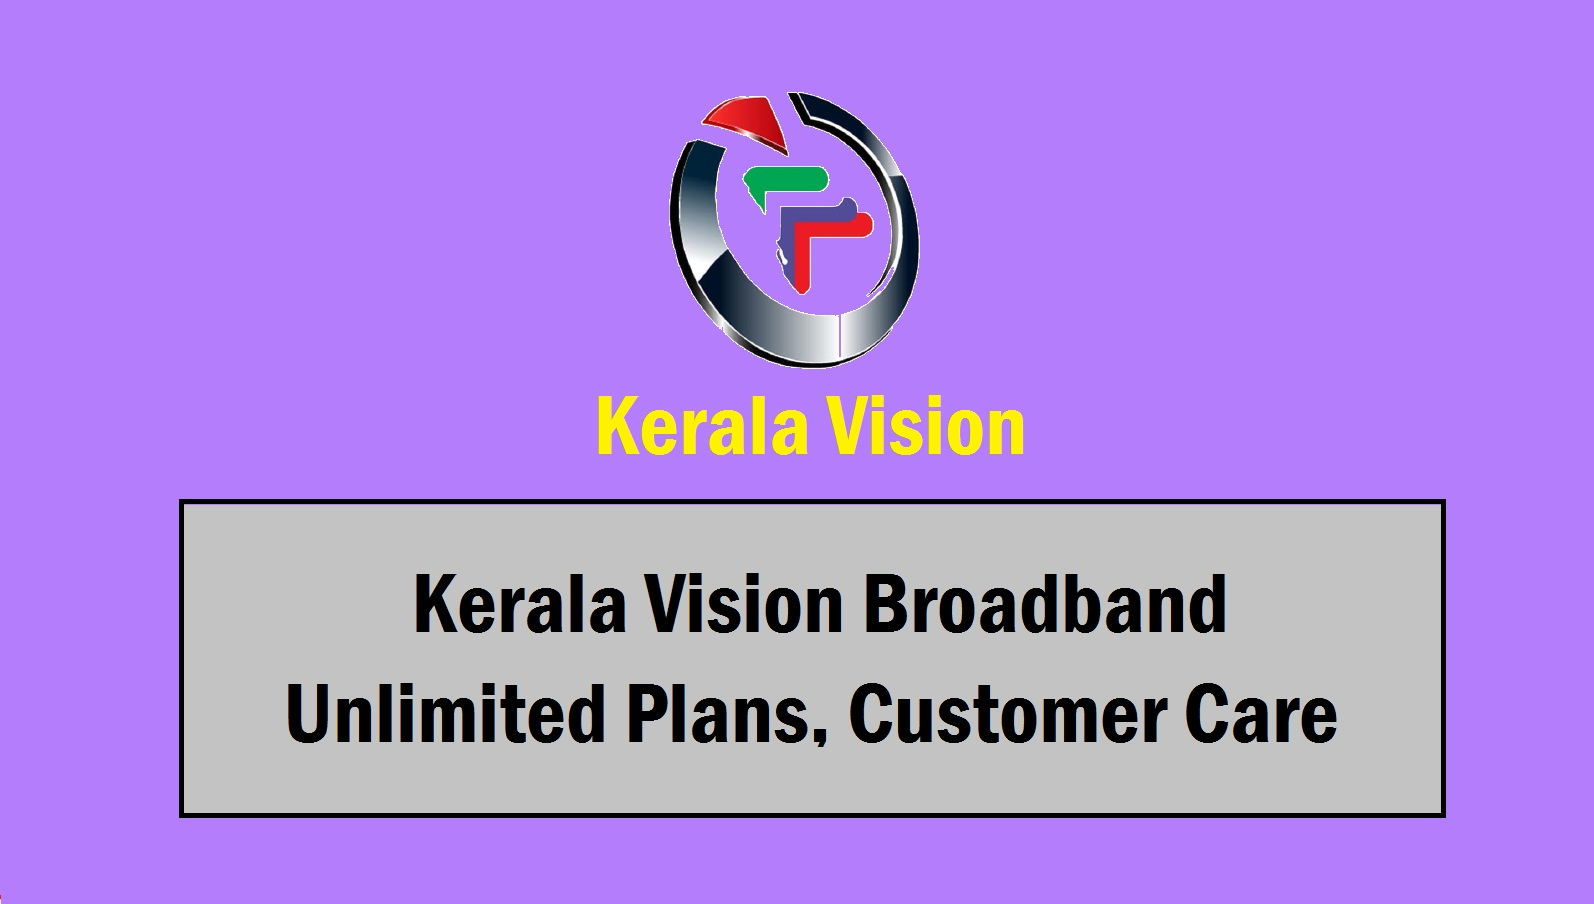 Kerala Vision Broadband Unlimited Plans